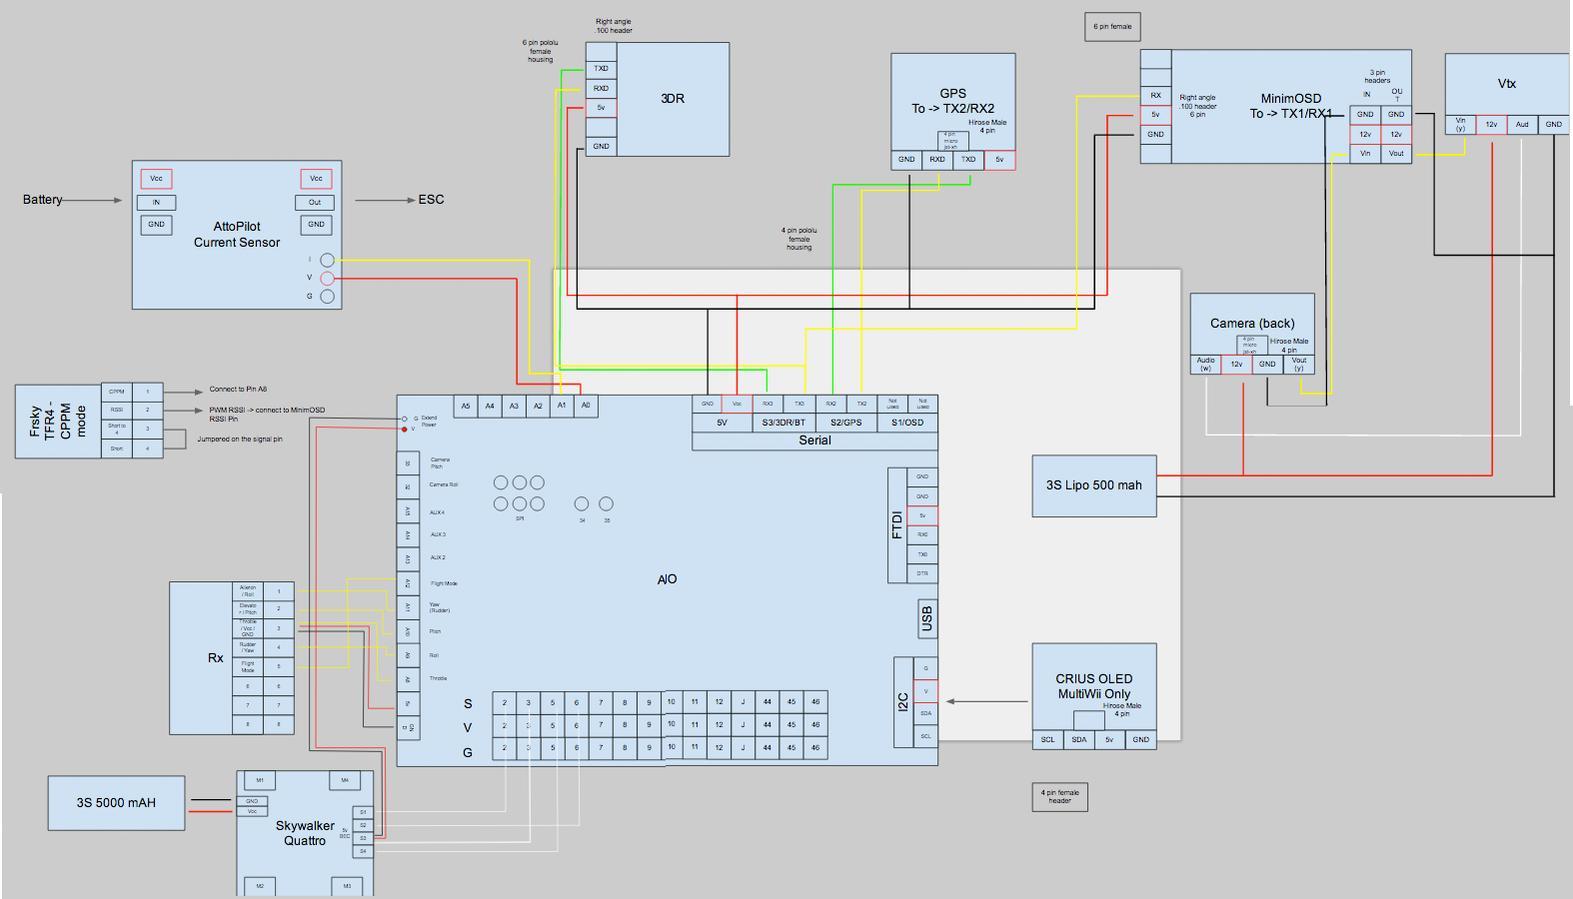 naza m v2 wiring diagram wiring library vespa wiring diagram name crius wiring diagram v2 jpg views 5,957